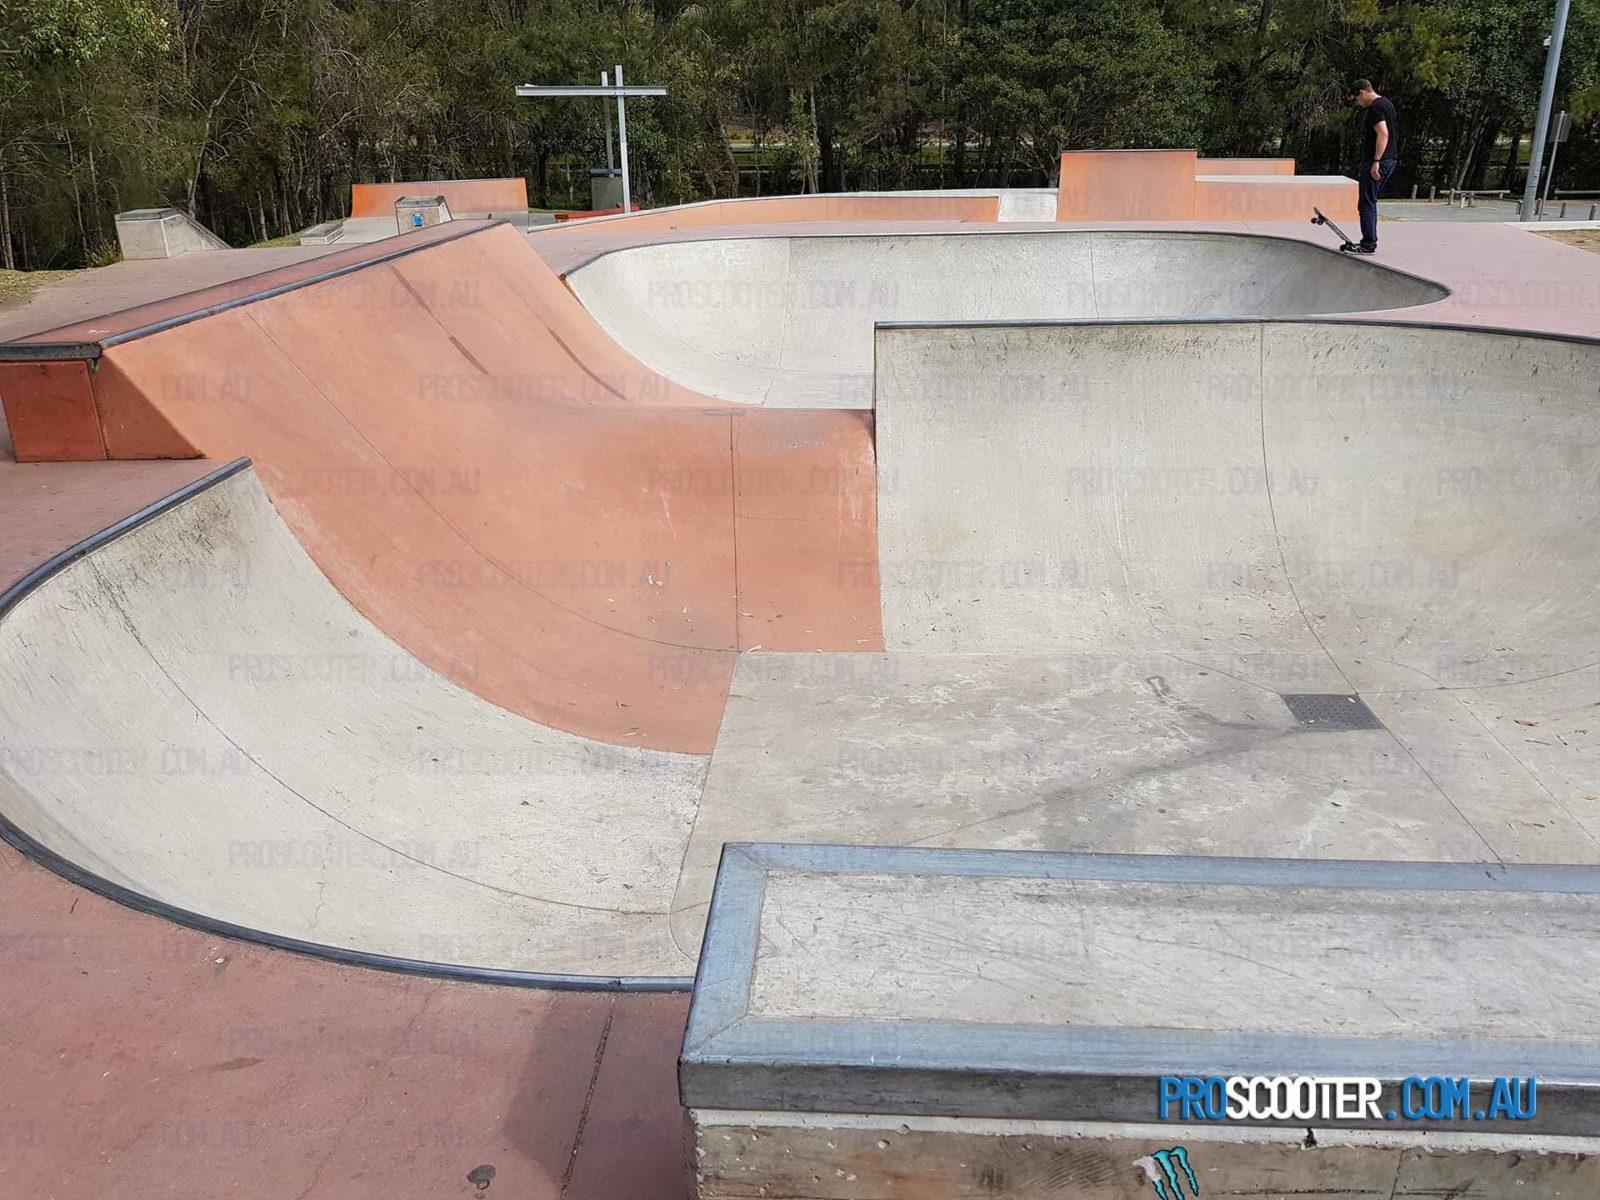 Underwood Skatepark Bowl Gap